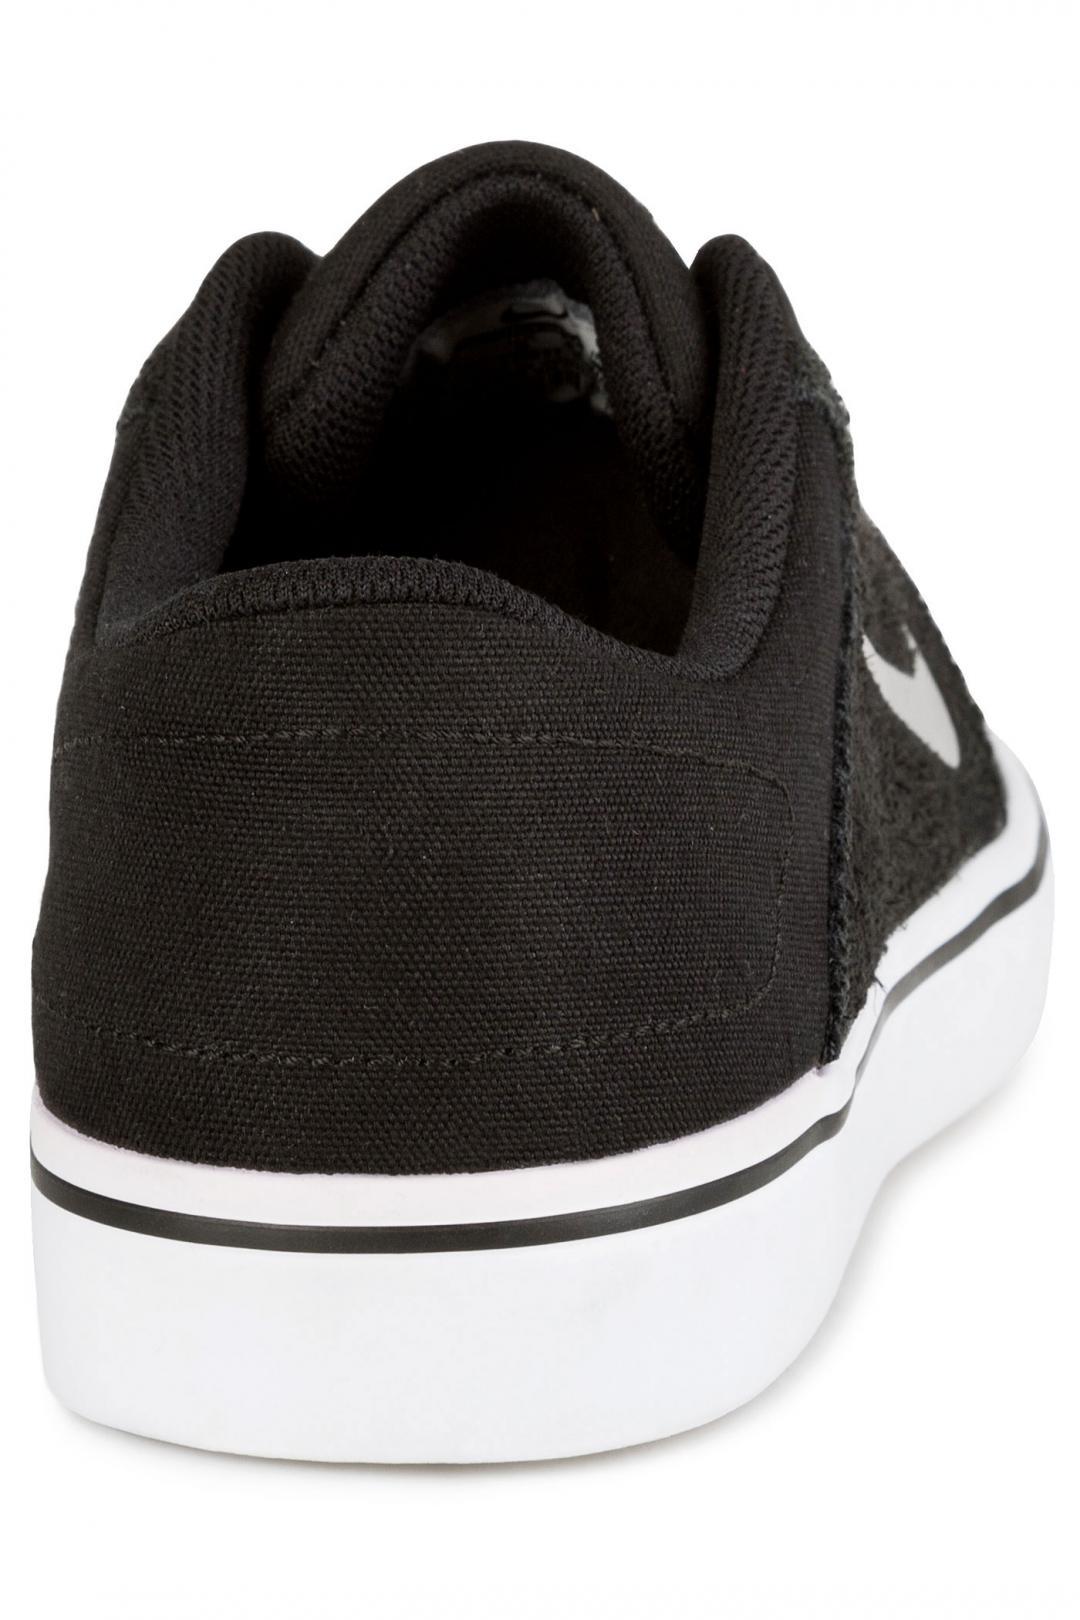 Uomo Nike SB Portmore black white medium grey   Sneakers low top